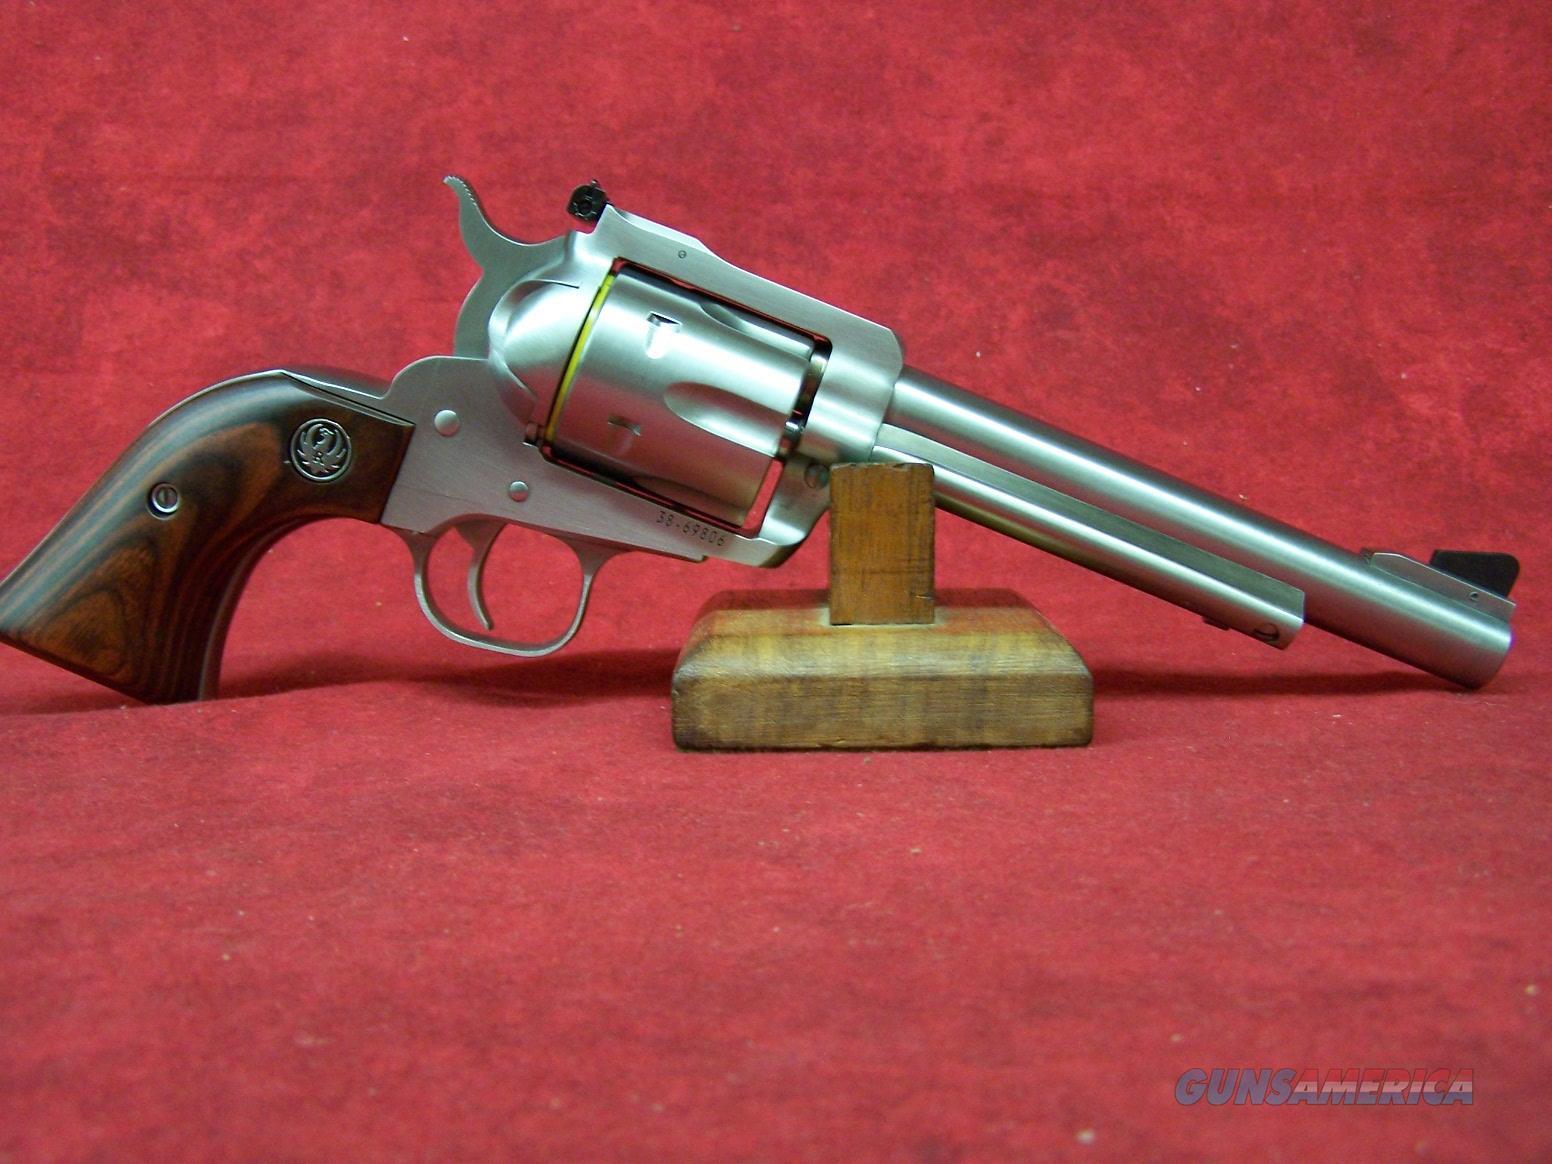 "Ruger Blackhawk 10MM / 40 S&W 6.5"" Barrel (00474)  Guns > Pistols > Ruger Single Action Revolvers > Blackhawk Type"